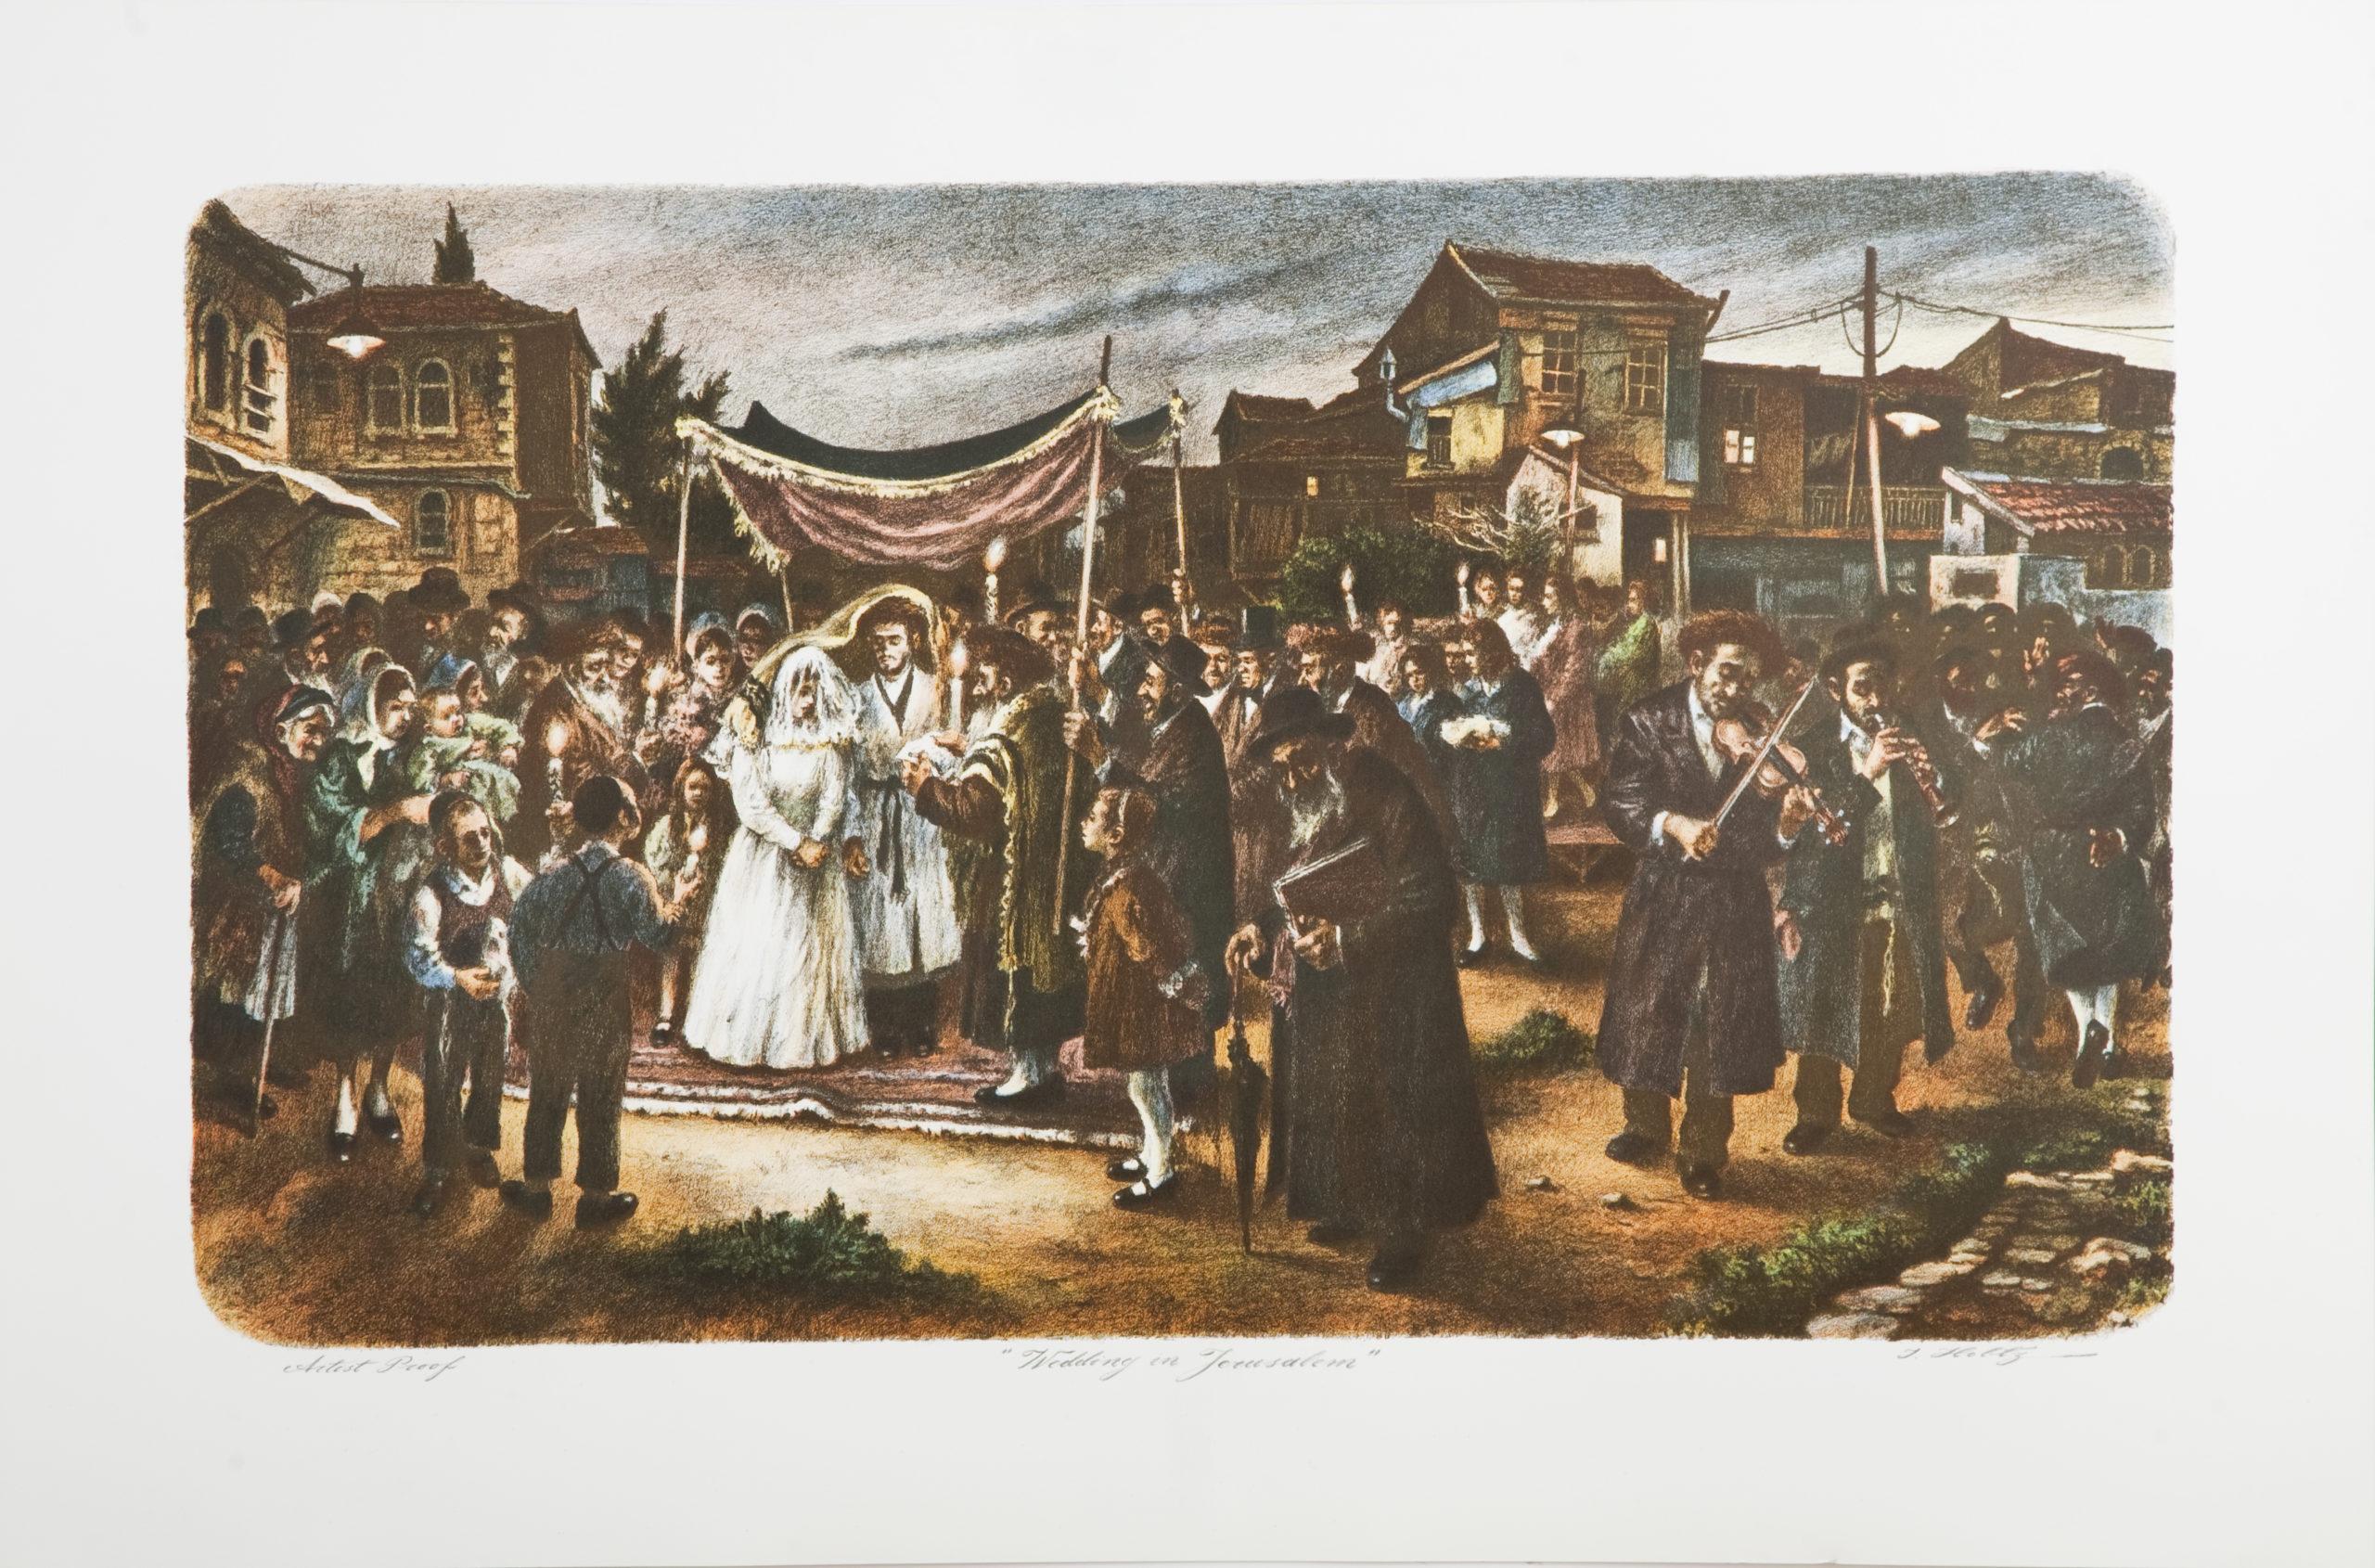 L37C Wedding in Jerusalem - Color - Lithograph - 29.5 x 22 - No Frame -$700